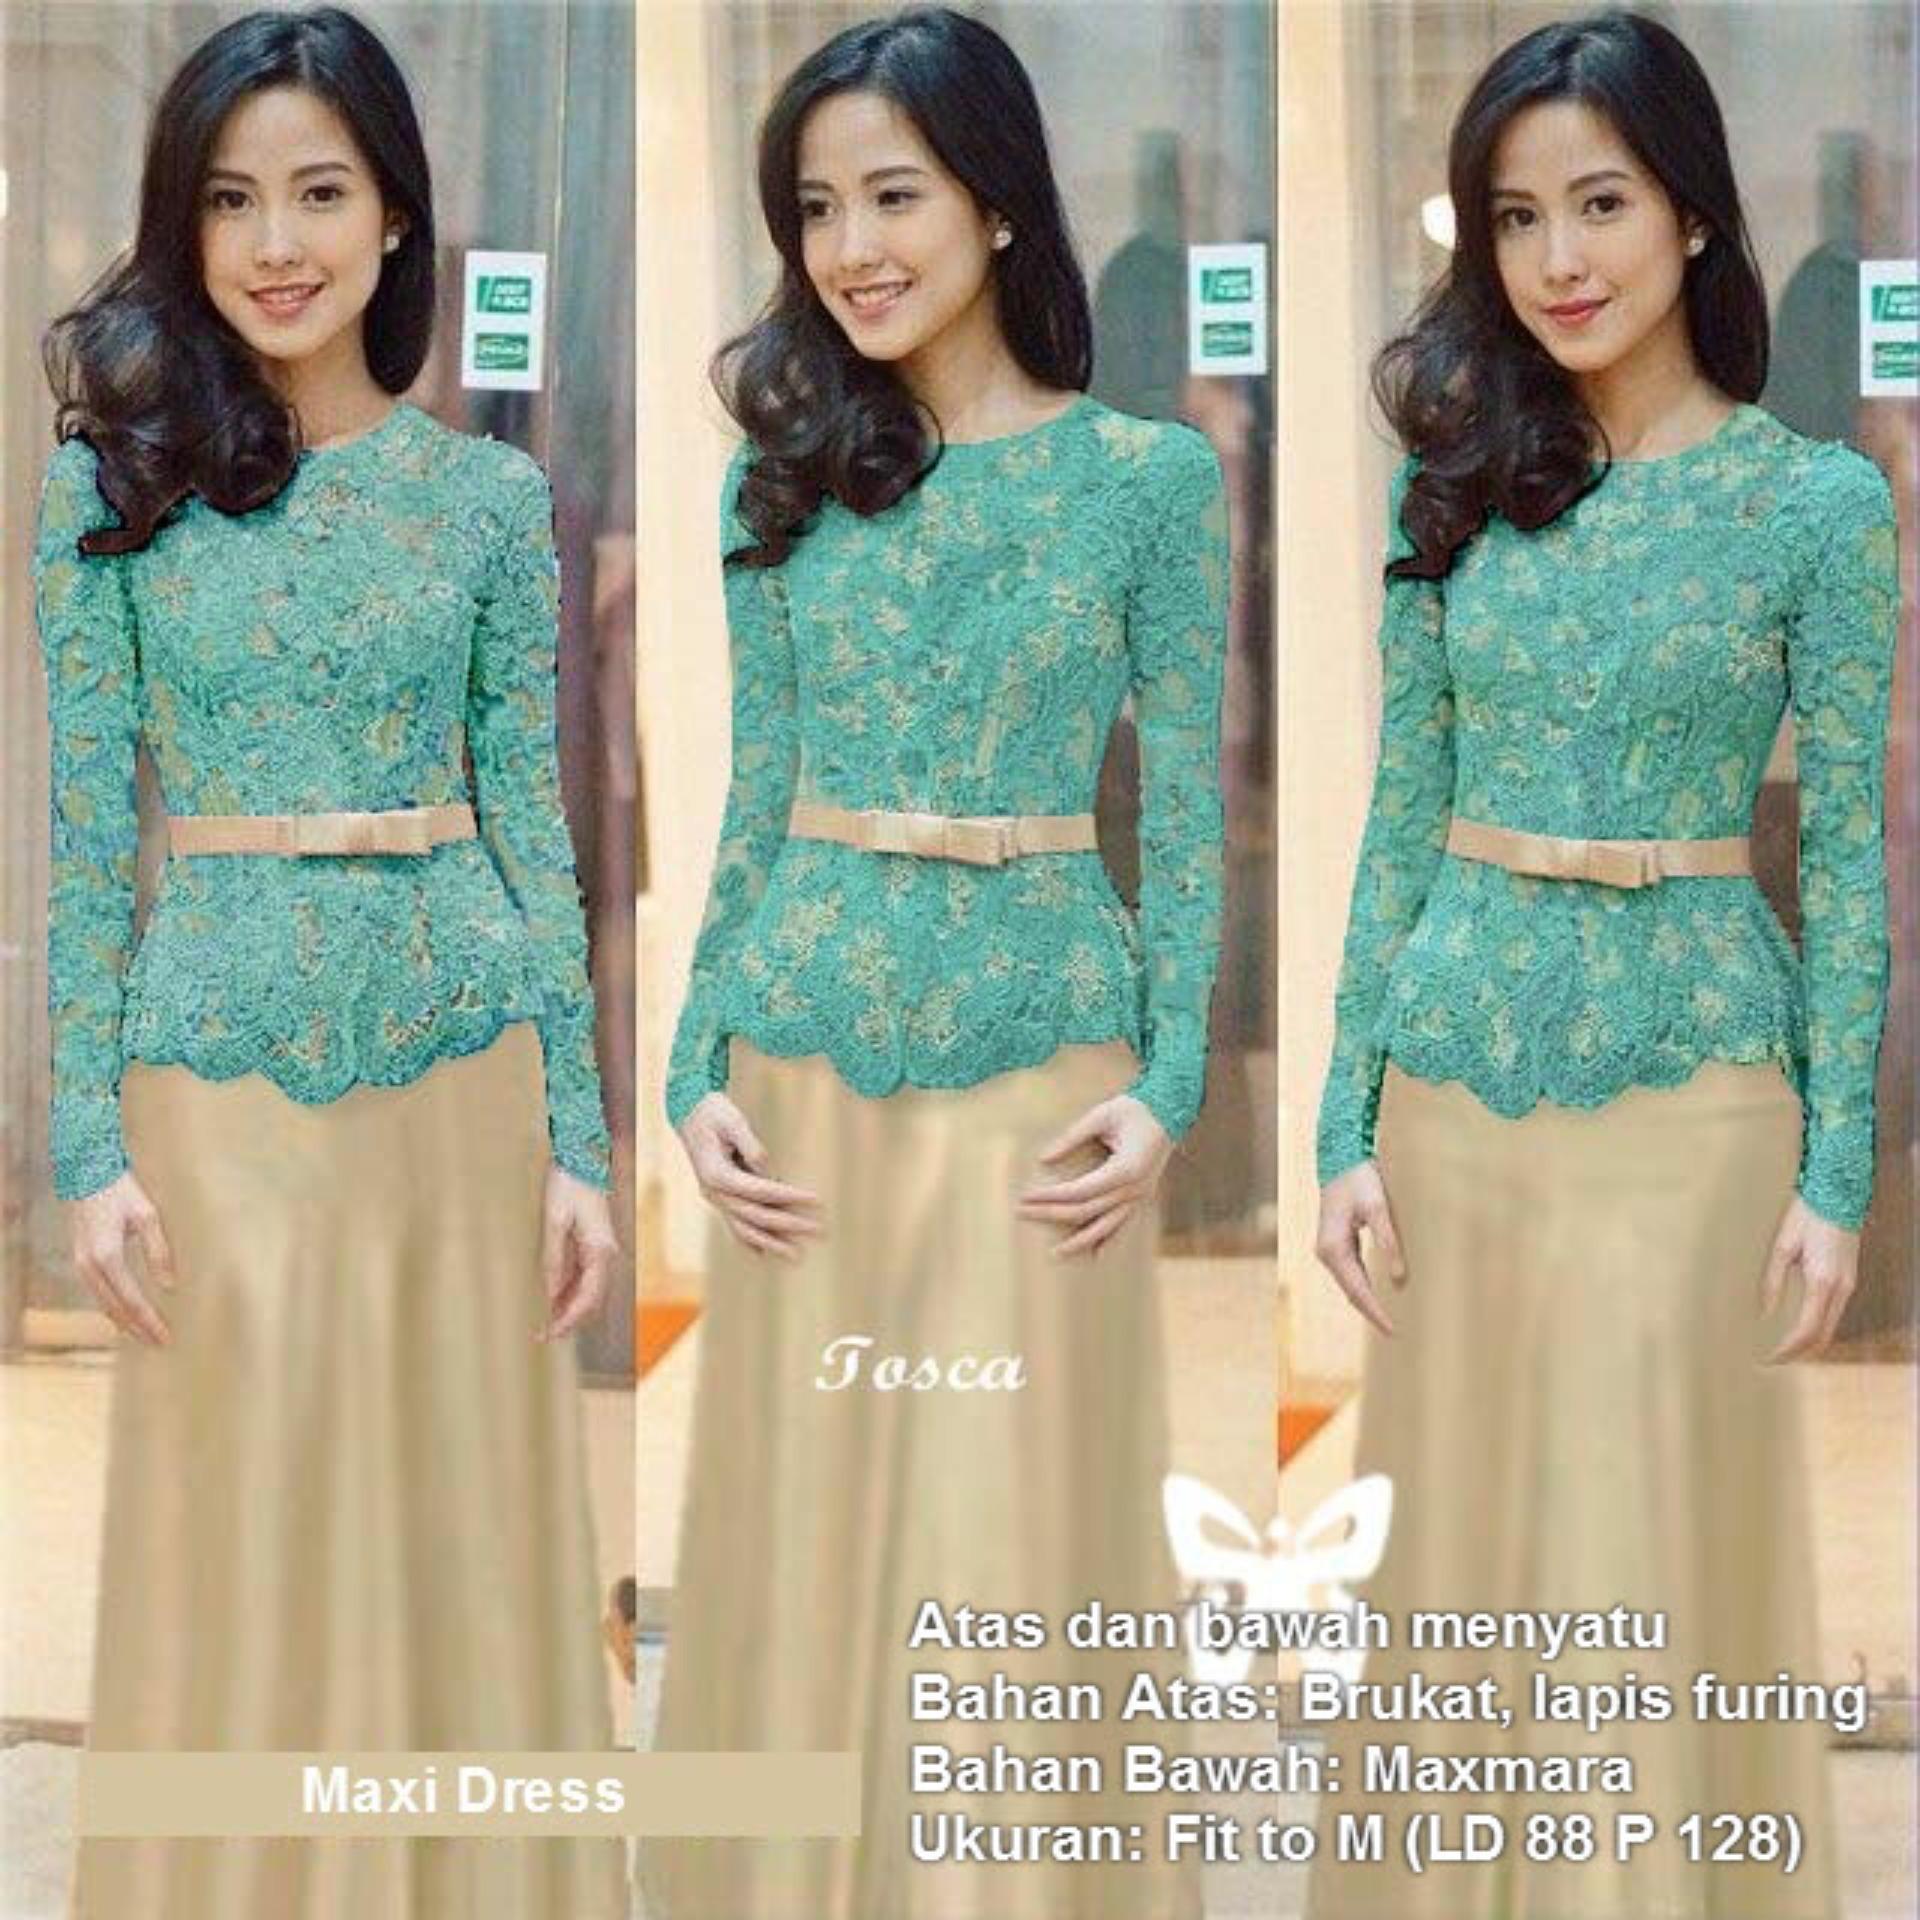 Flavia Store Maxi Dress Lengan Panjang Brukat Fs0202 Tosca Kebaya Modern Gamis Syari Gaun Pesta Muslimah Baju Muslim Wanita Syar I Hijab